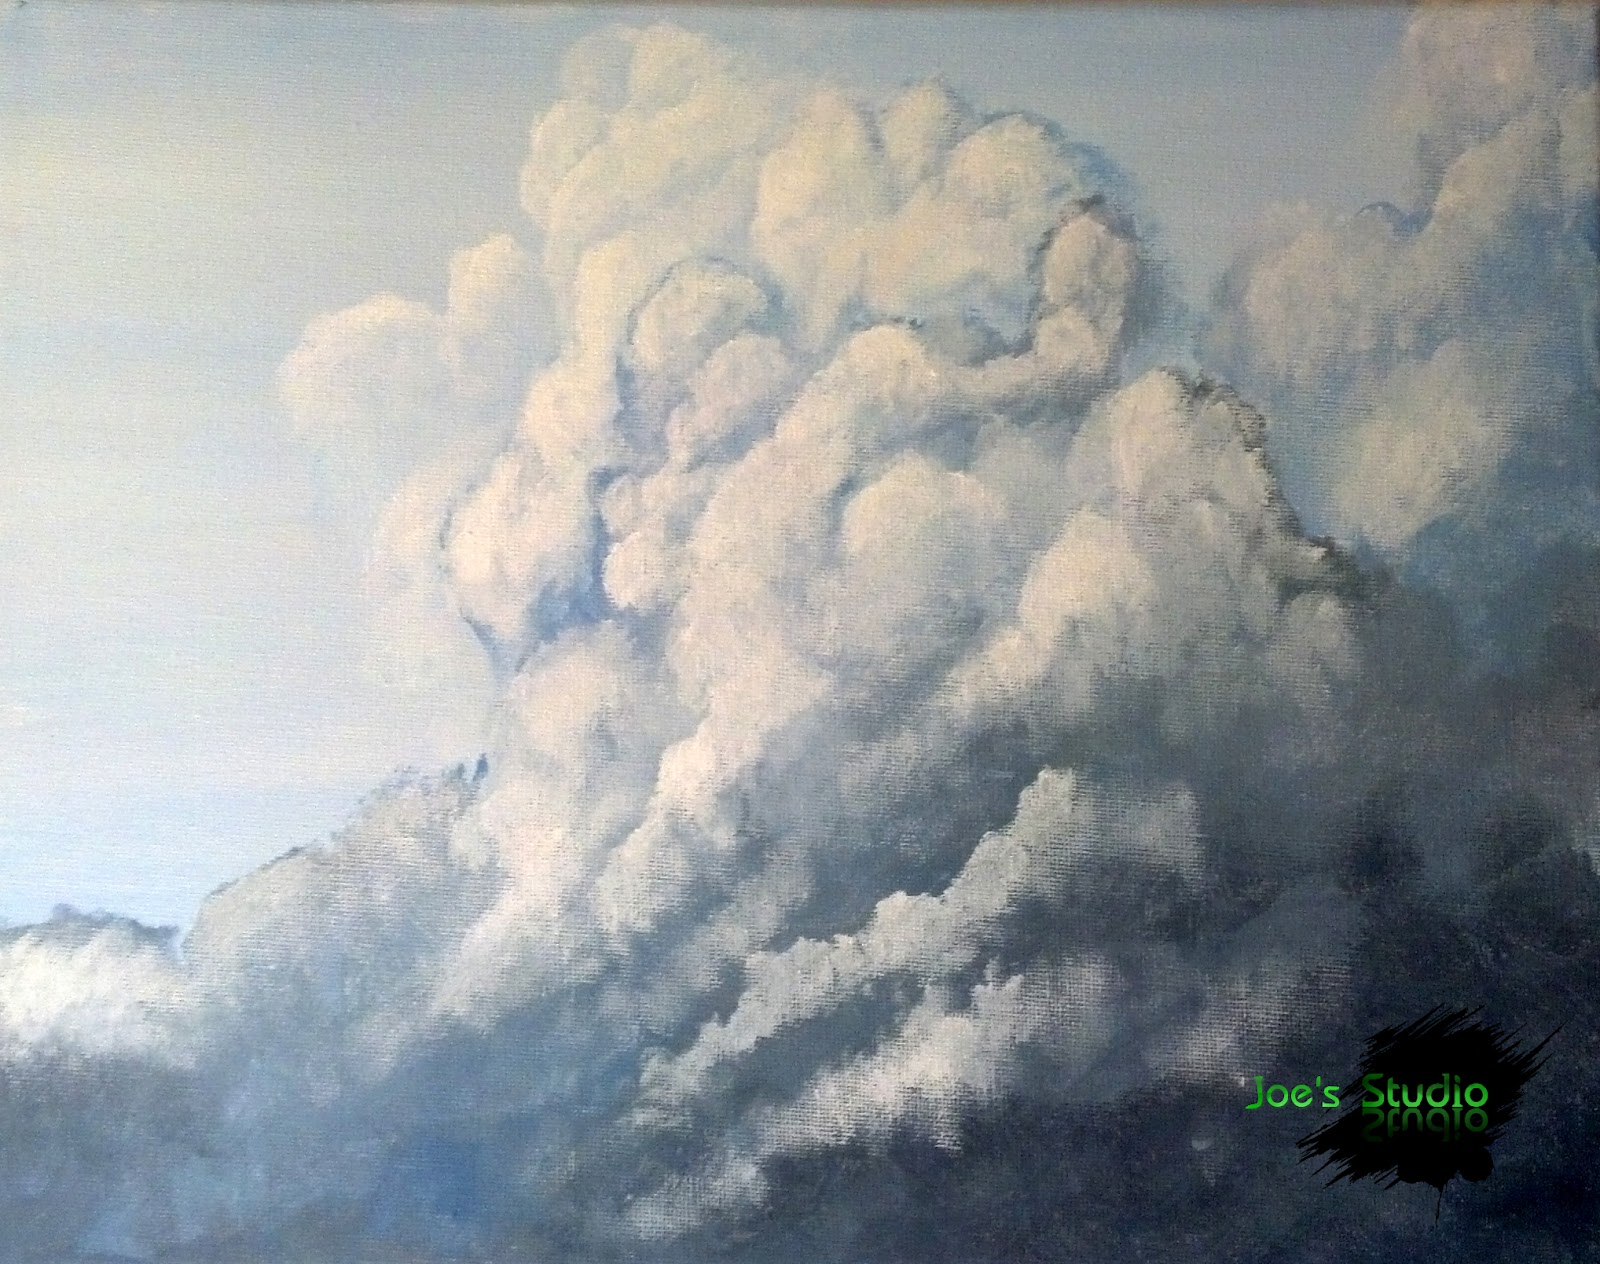 1600x1264 Joe's Studio Painting Clouds